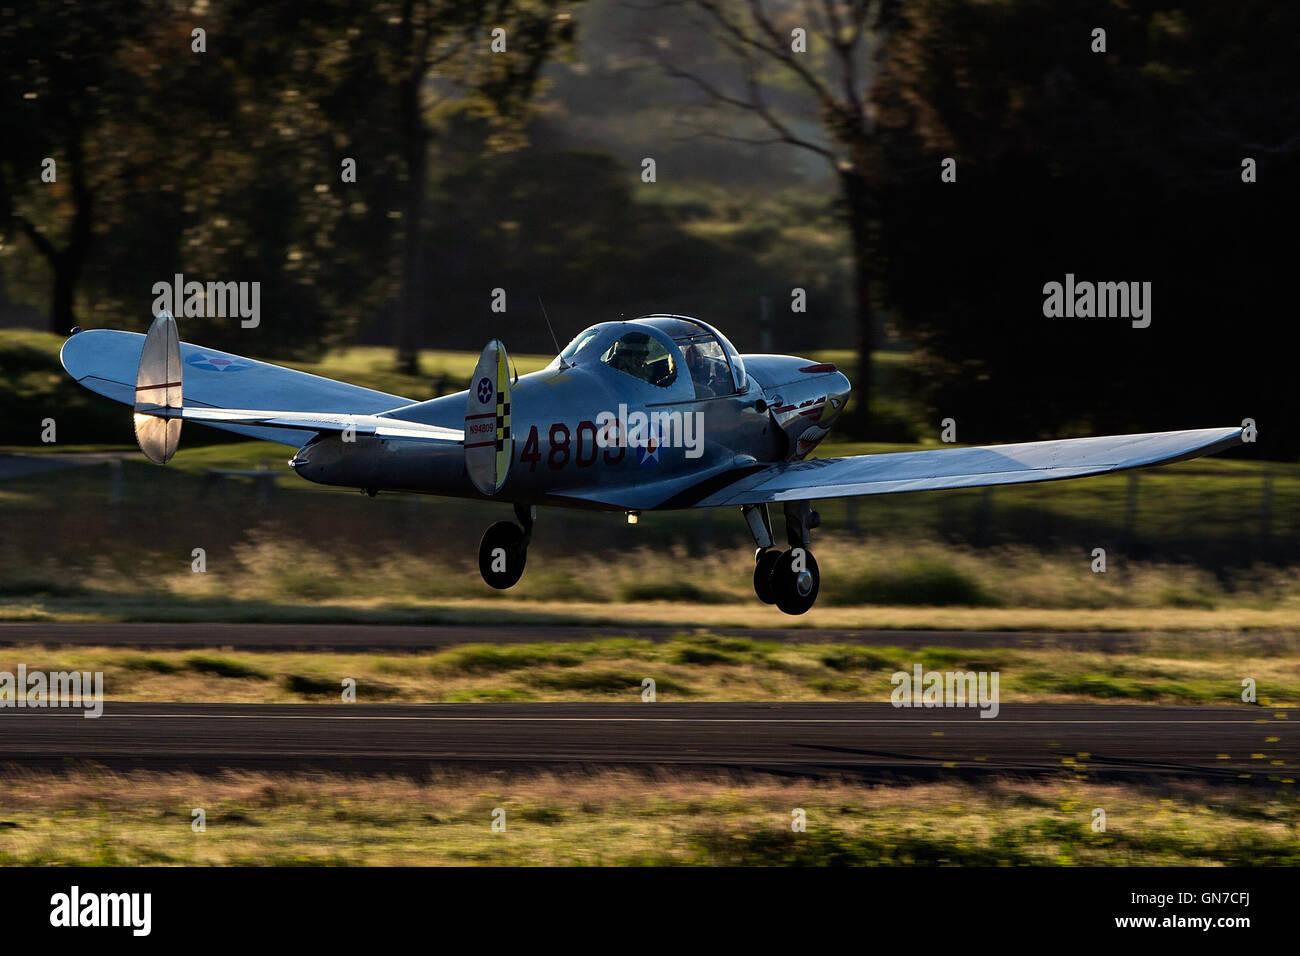 ERCO 415-E Ercoupe (N94809) takes off from Palo Alto Airport (KPAO), Palo Alto, California, United States of America - Stock Image